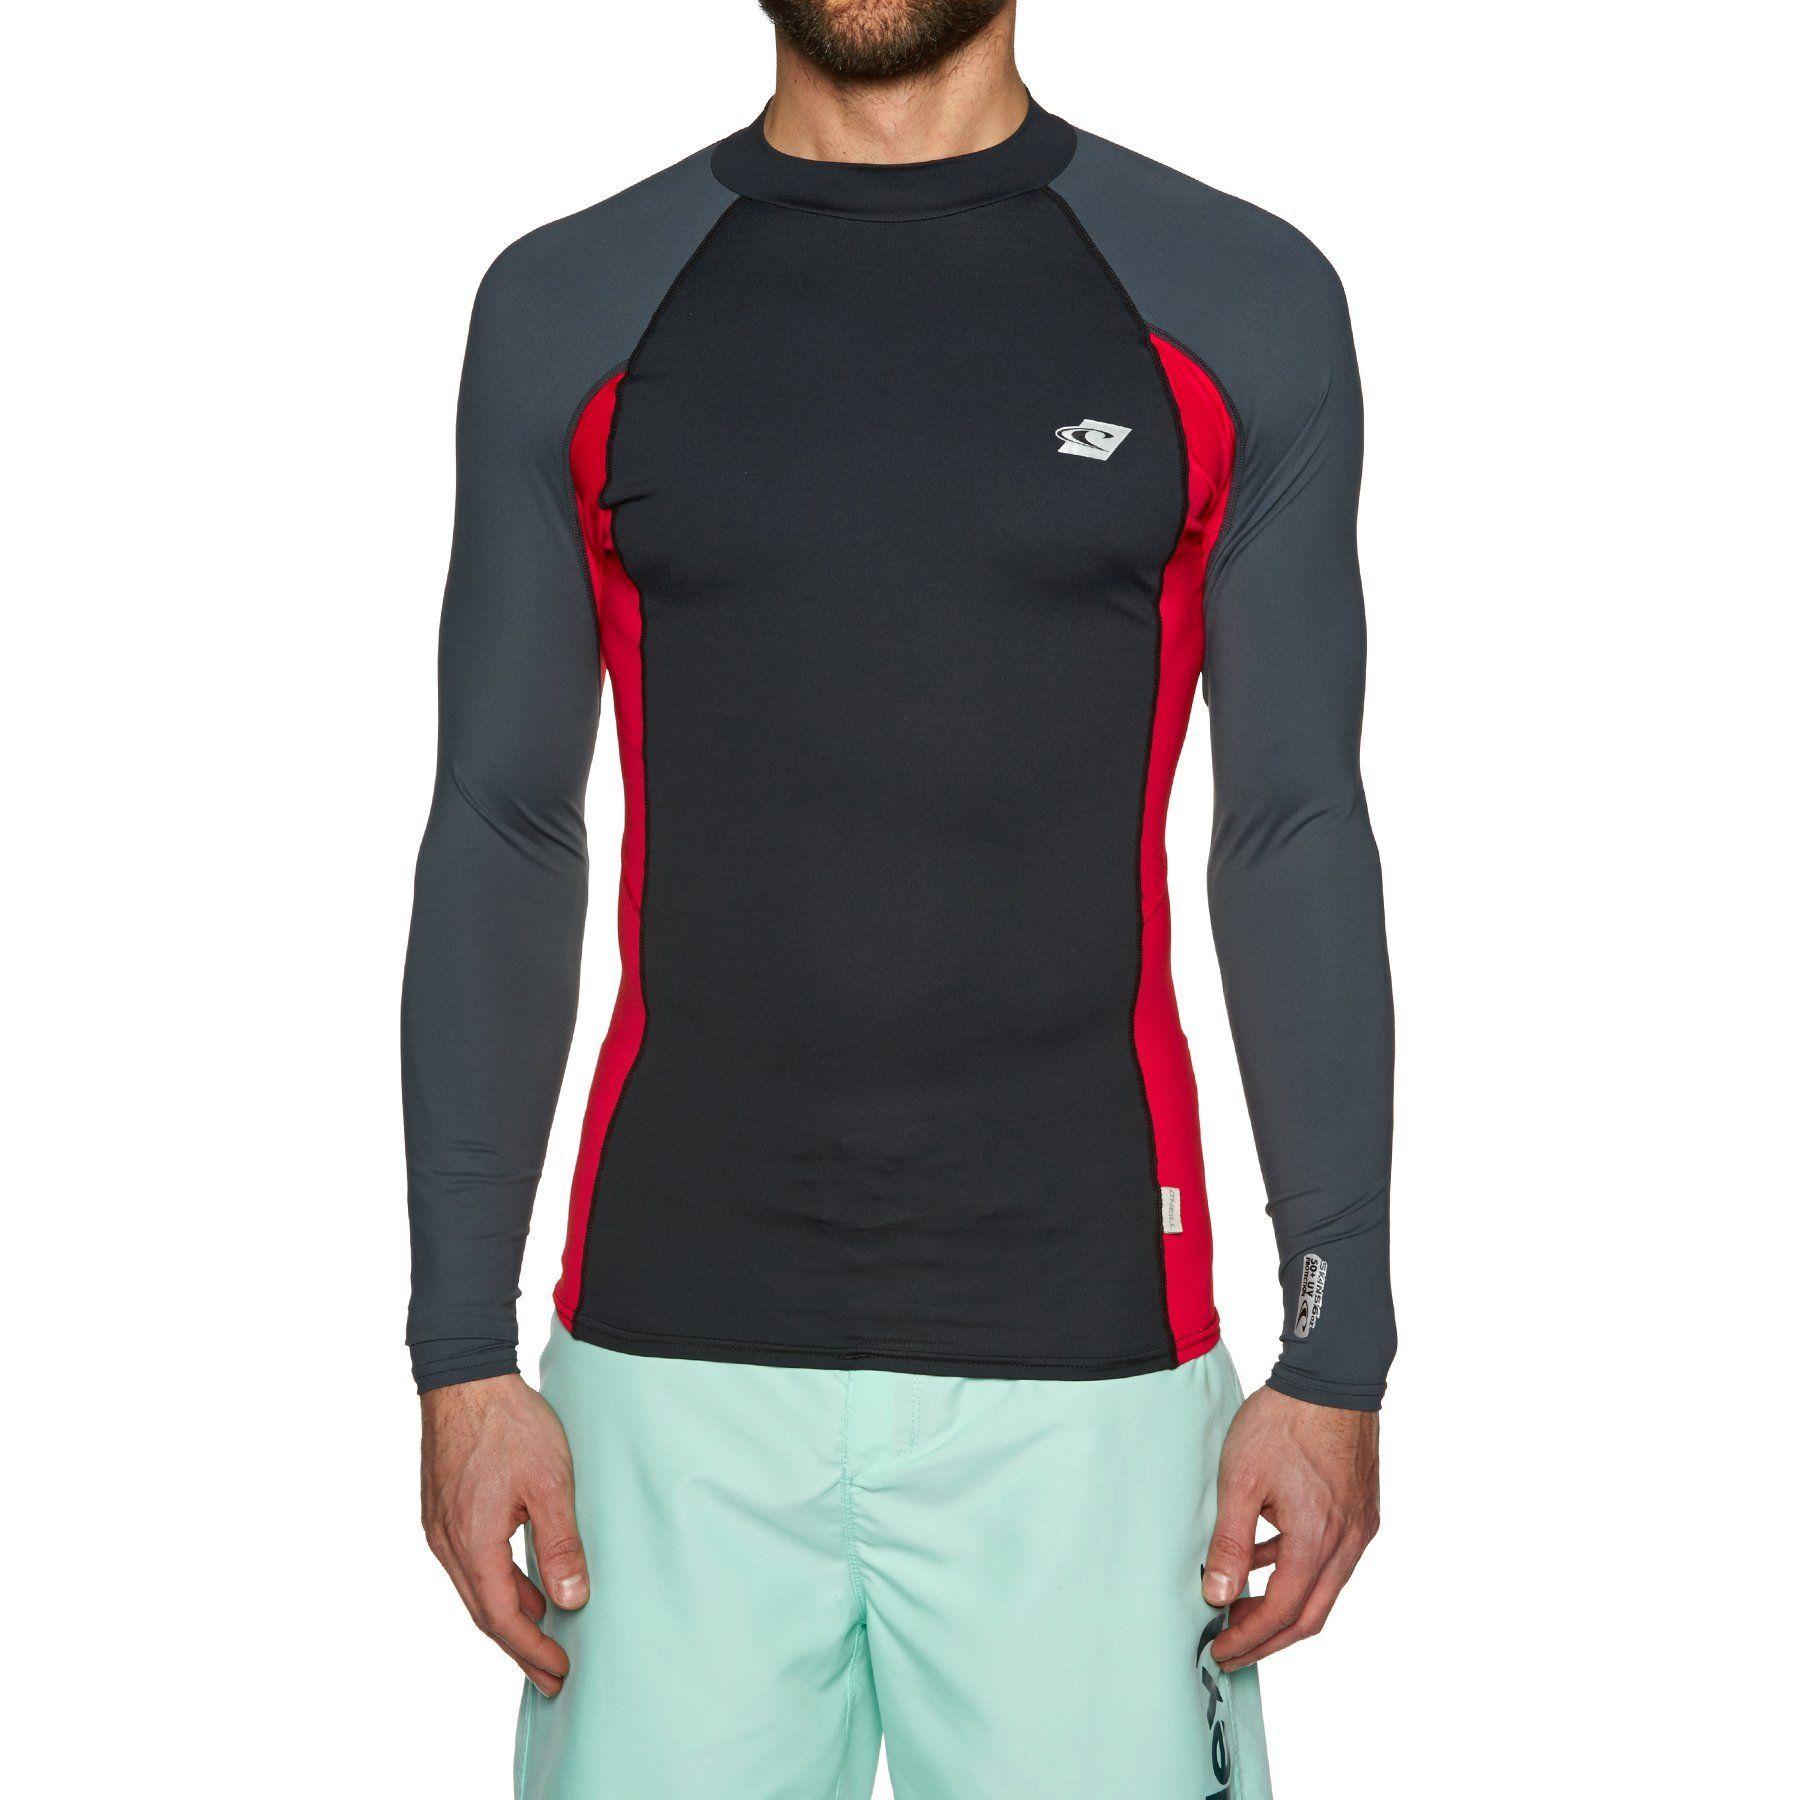 Long Sleeve Rash Guard ONeill Wetsuits Mens Oneill Premium Skins UPF 50